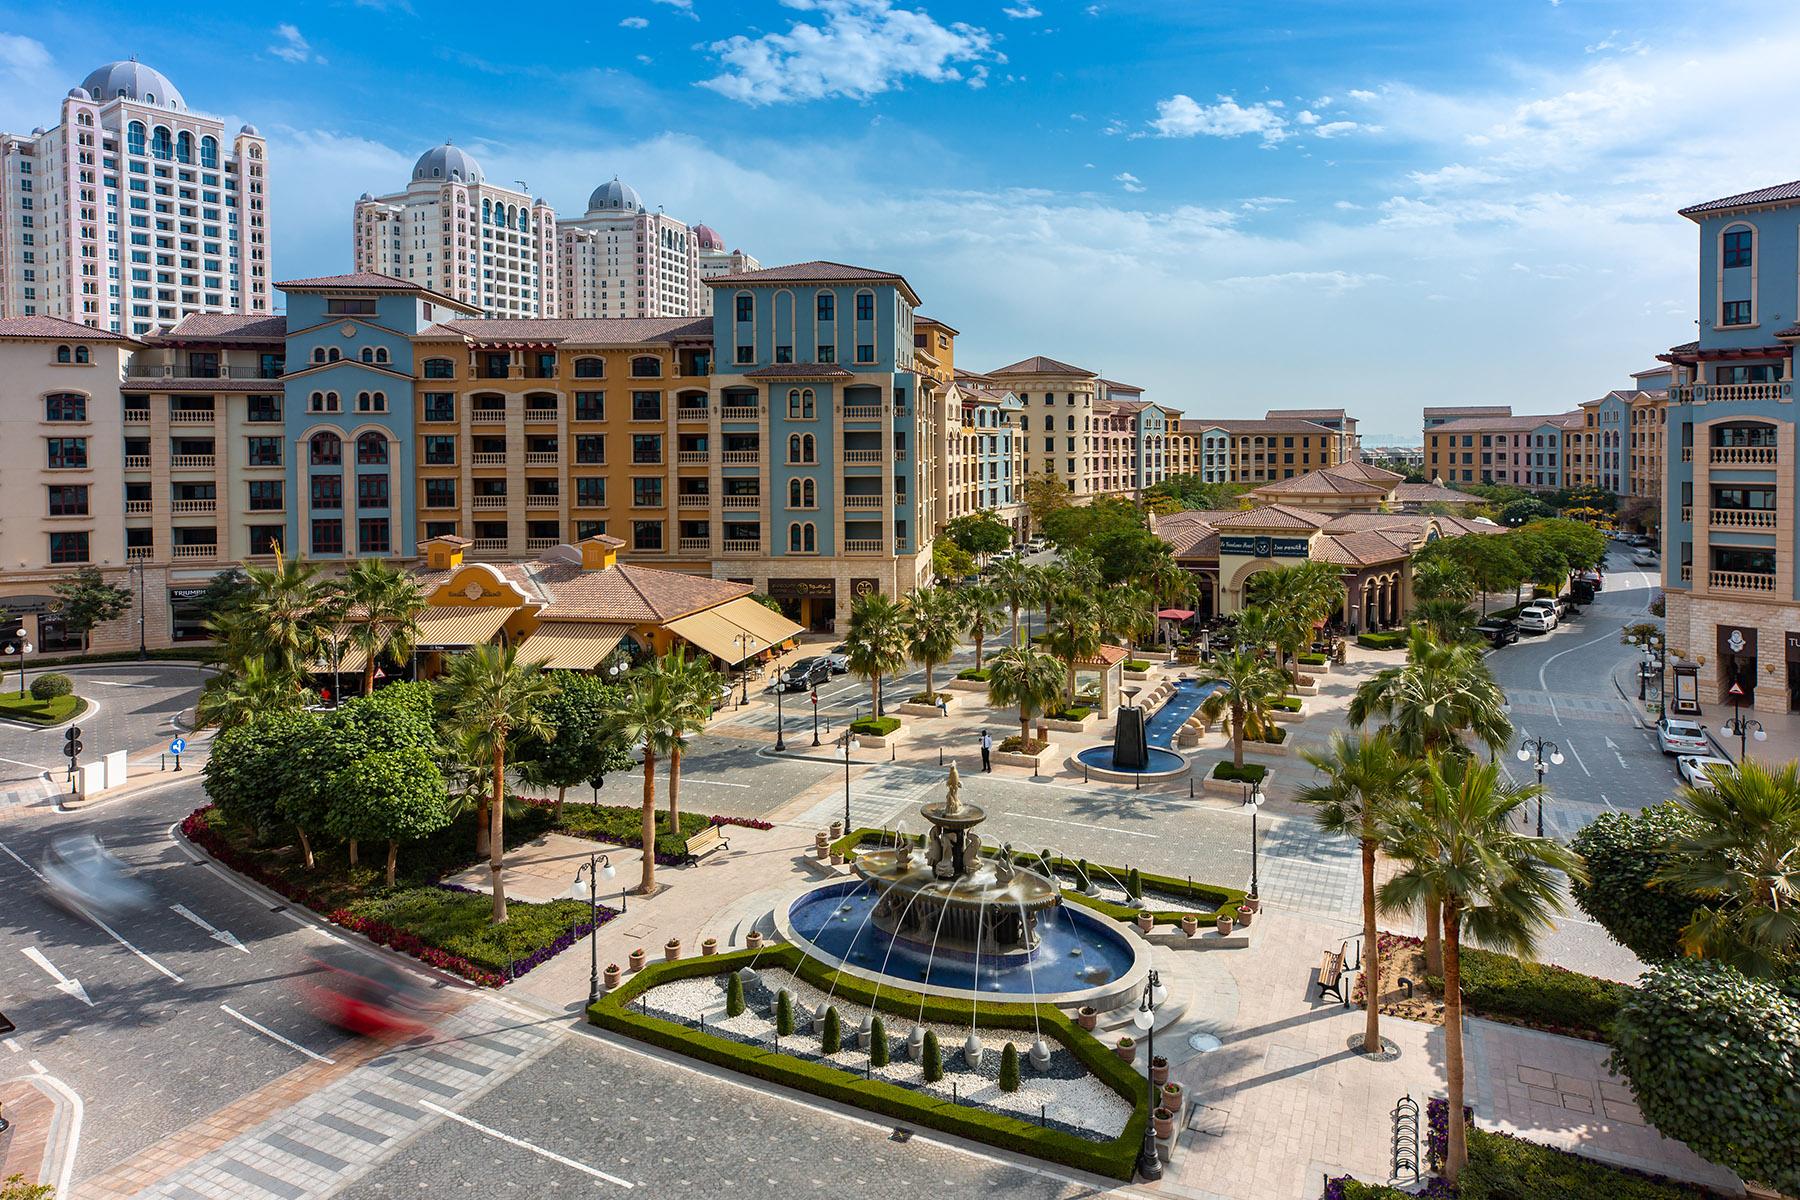 The Pearl, a residential development in Qatar